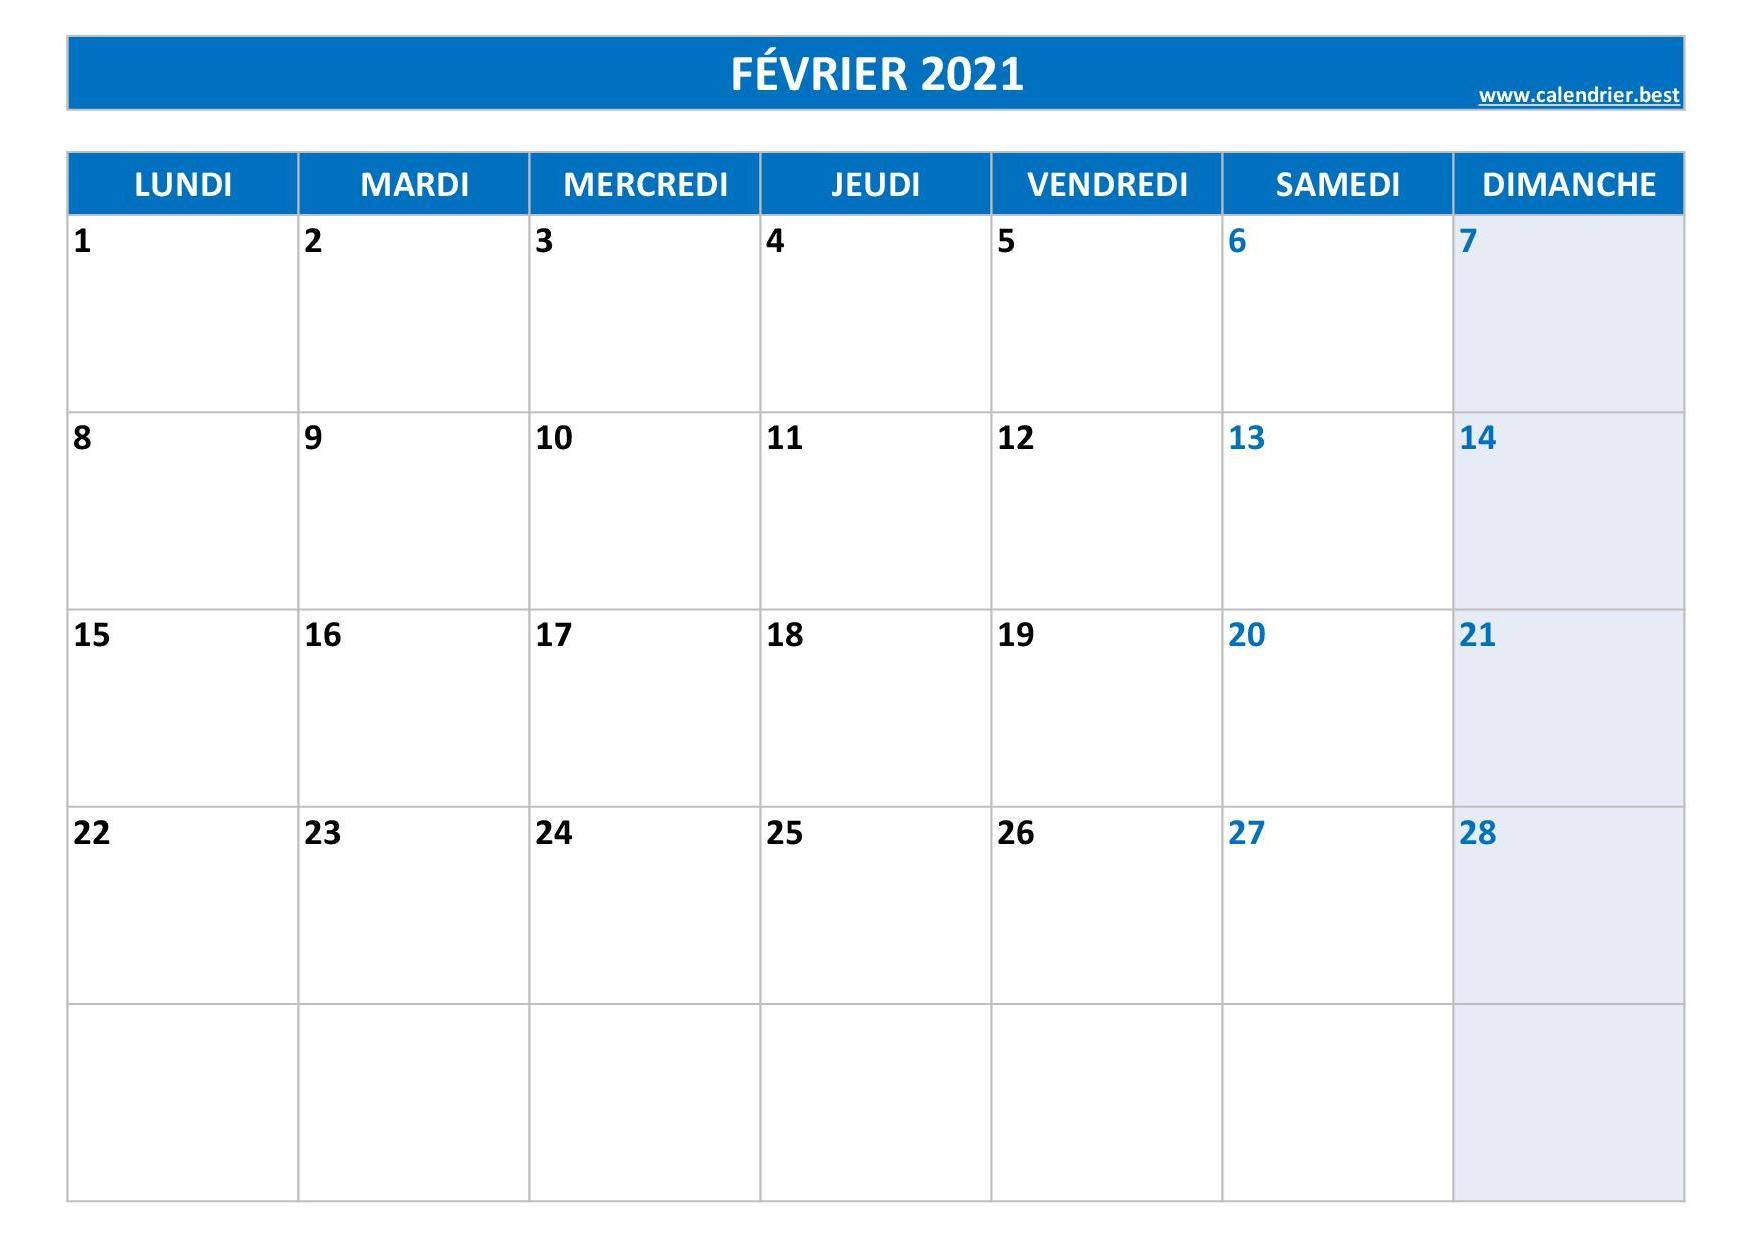 Calendrier Février 2021 À Consulter Ou Imprimer inside Calendrier À Imprimer 2021